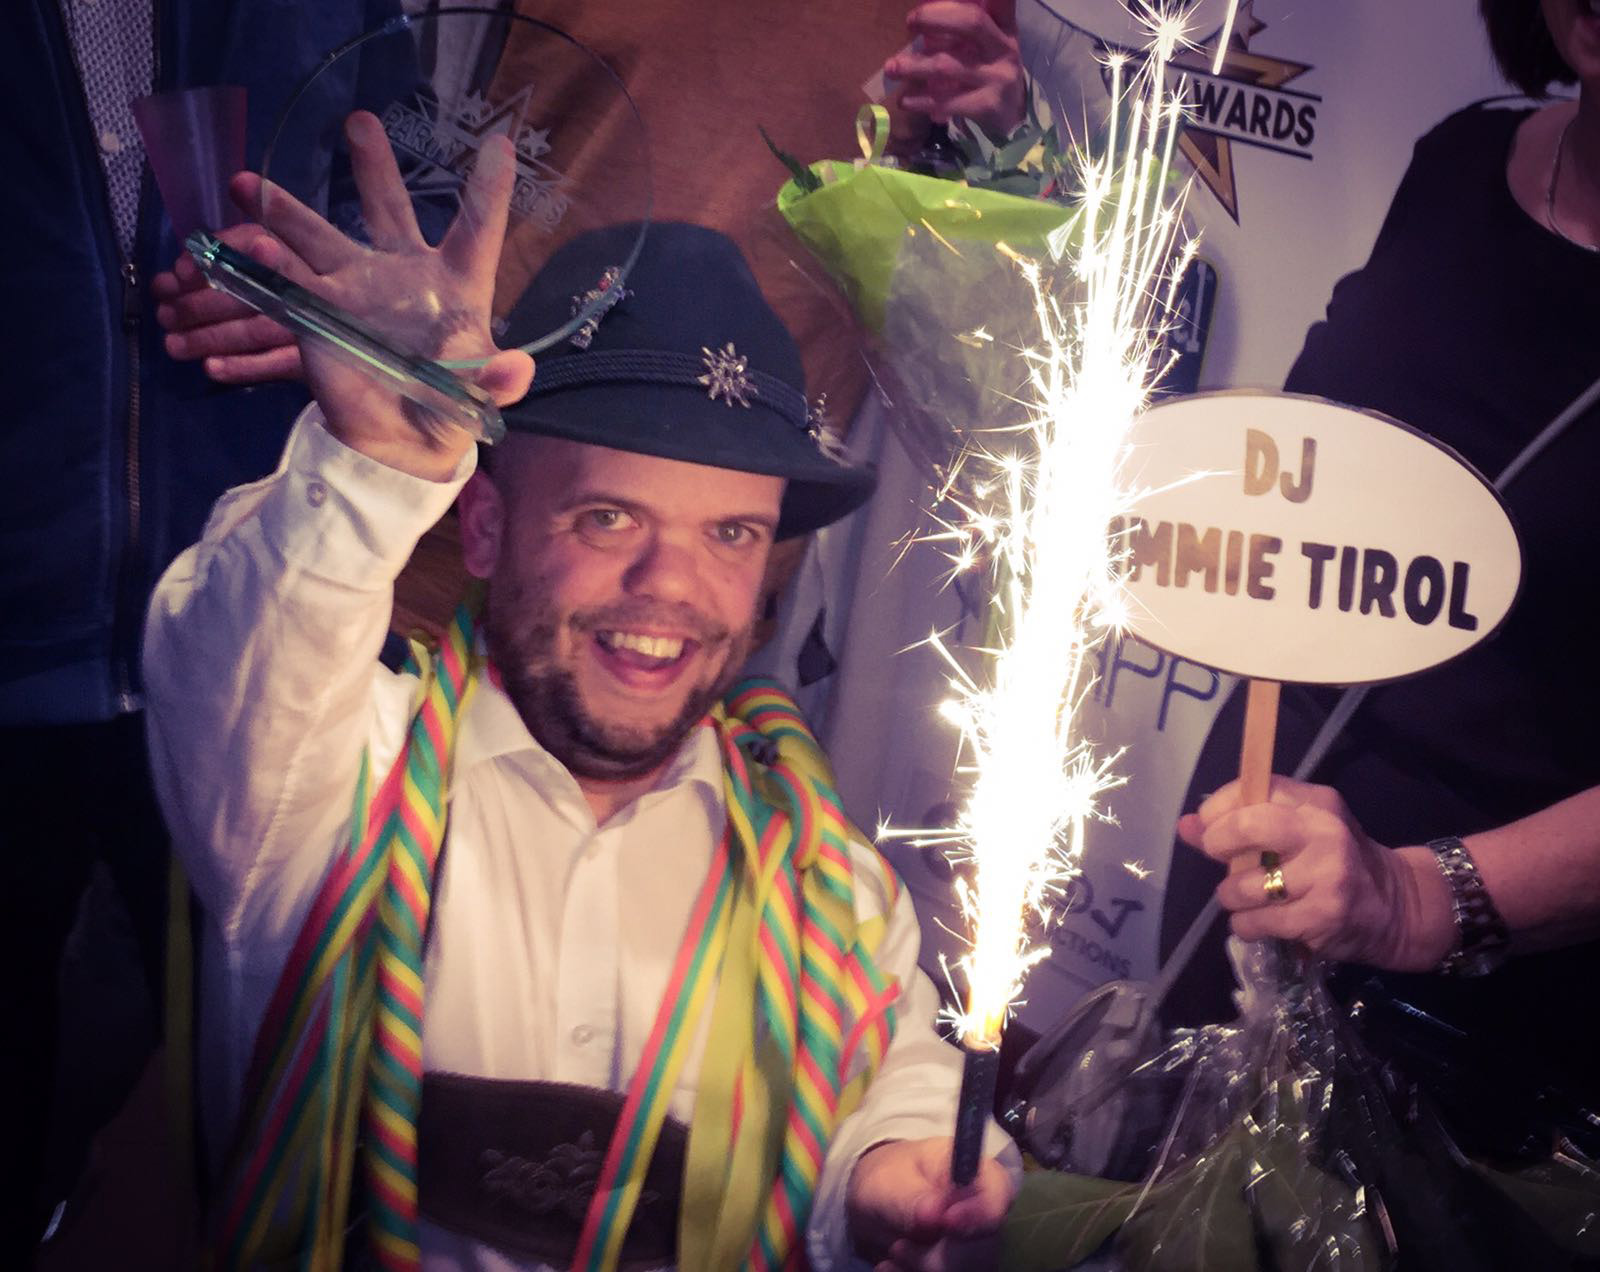 DJ_Timmie_Tirol_PartyAwards